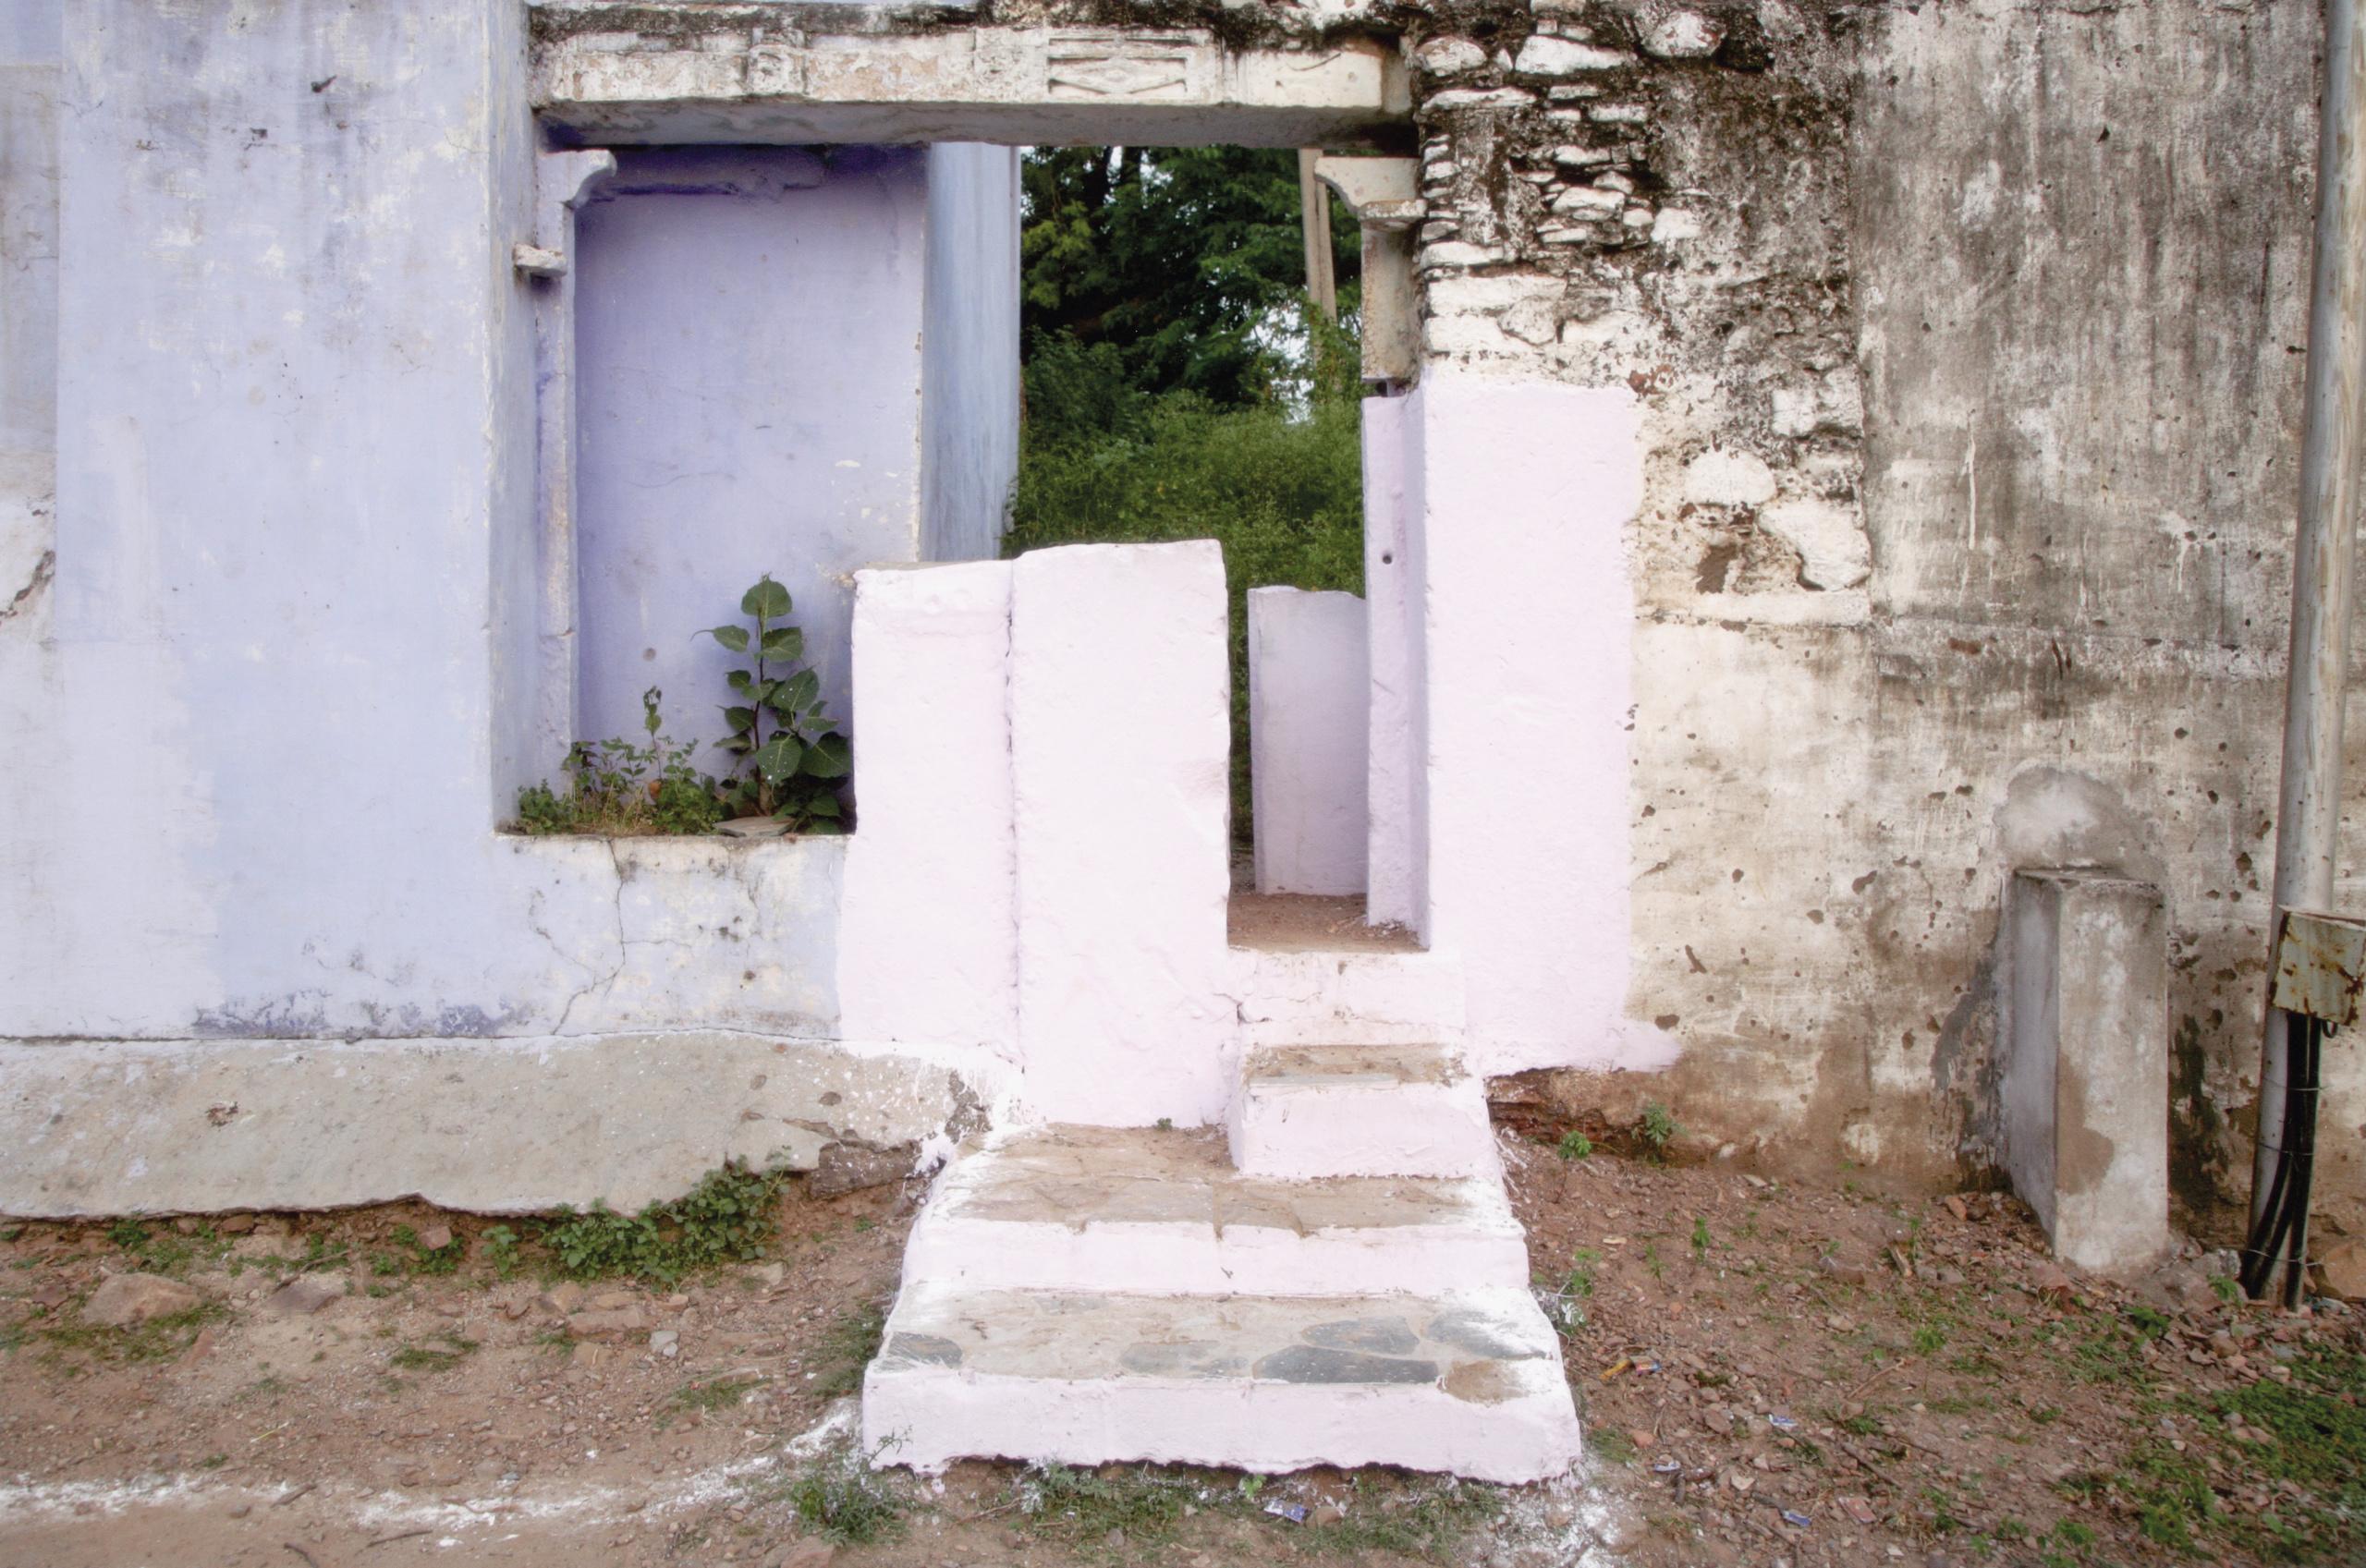 "Anthea Baxter-Page, Puja Gateway, Bundi, 2018. Archival digital print, 24 x 36""."